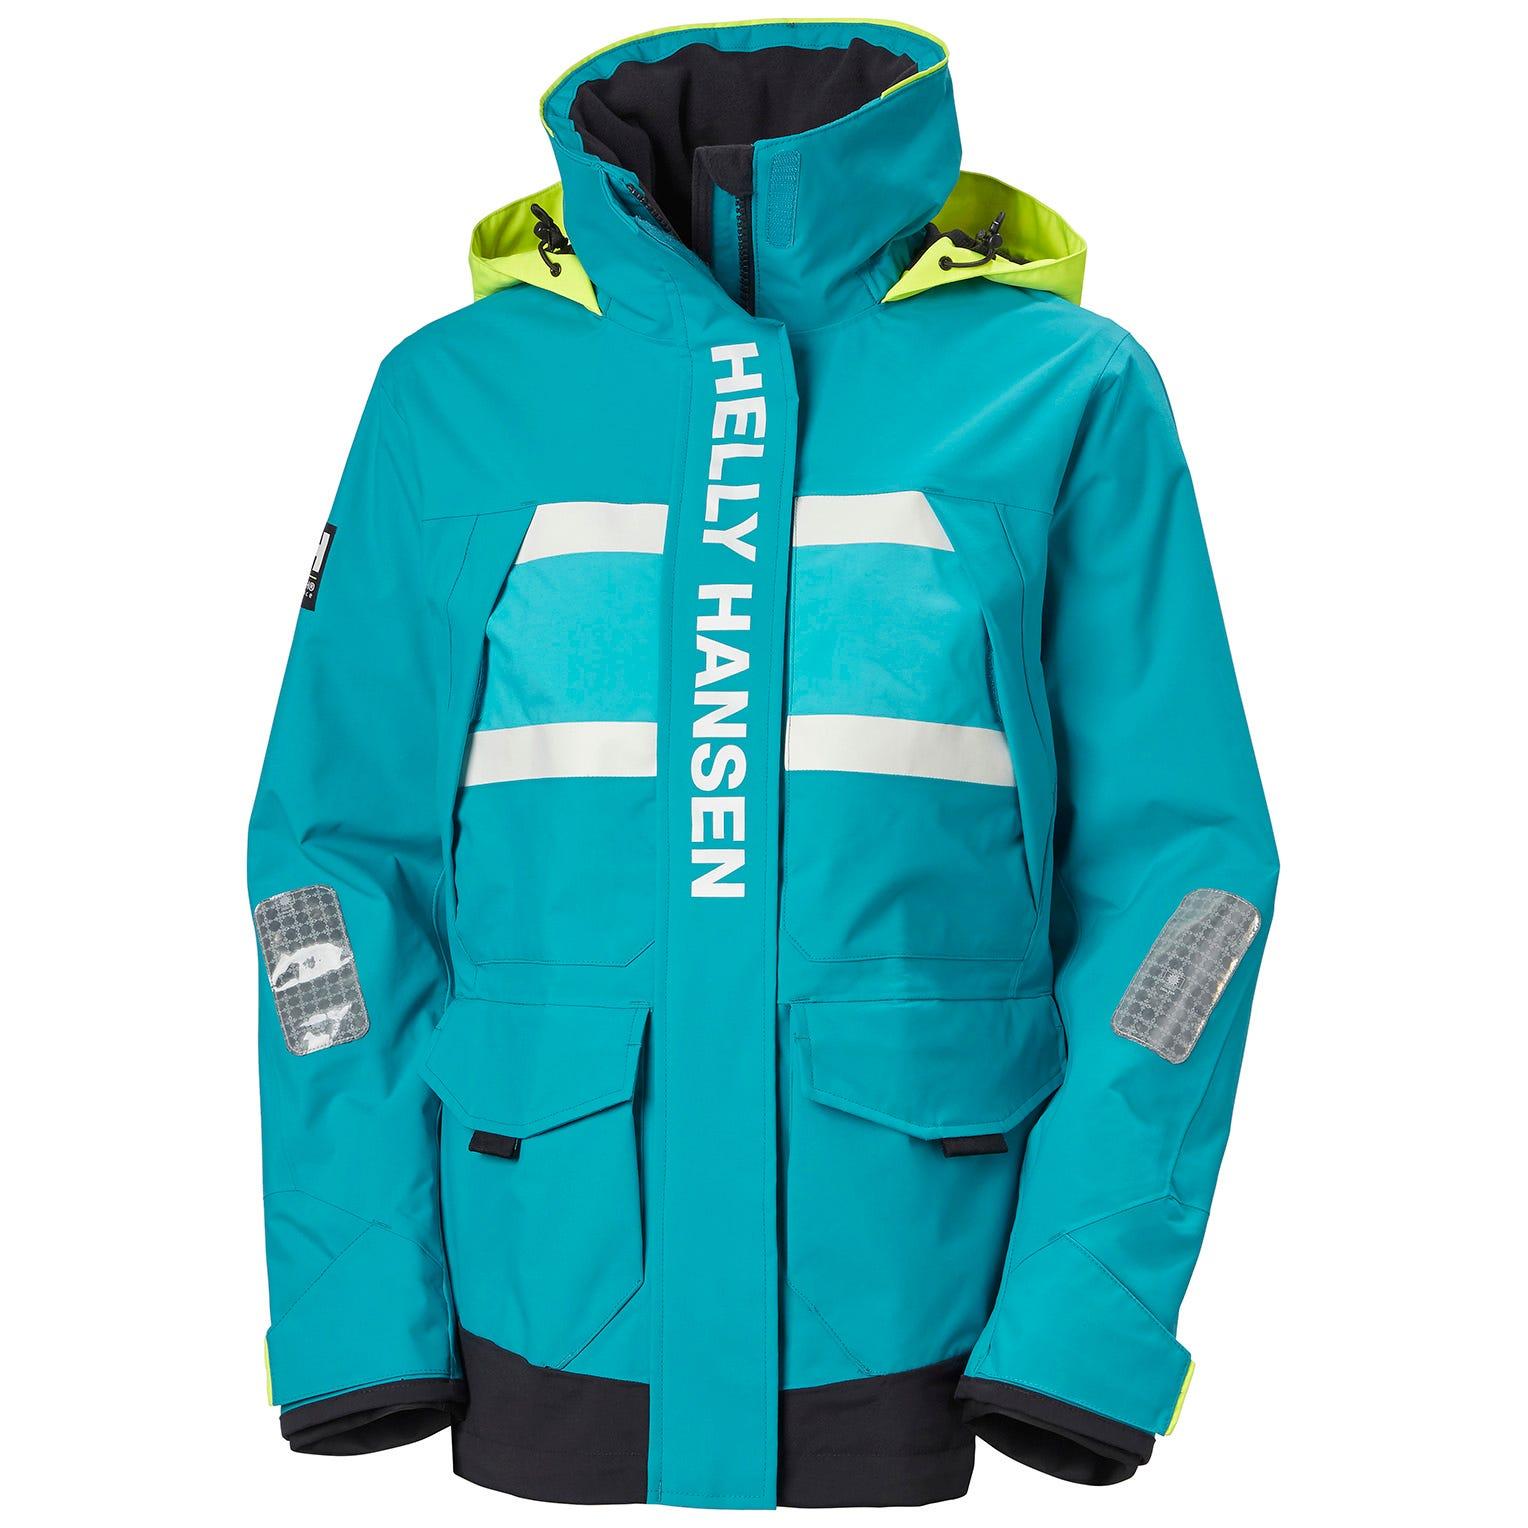 Helly Hansen Womens Sailing Jacket XL